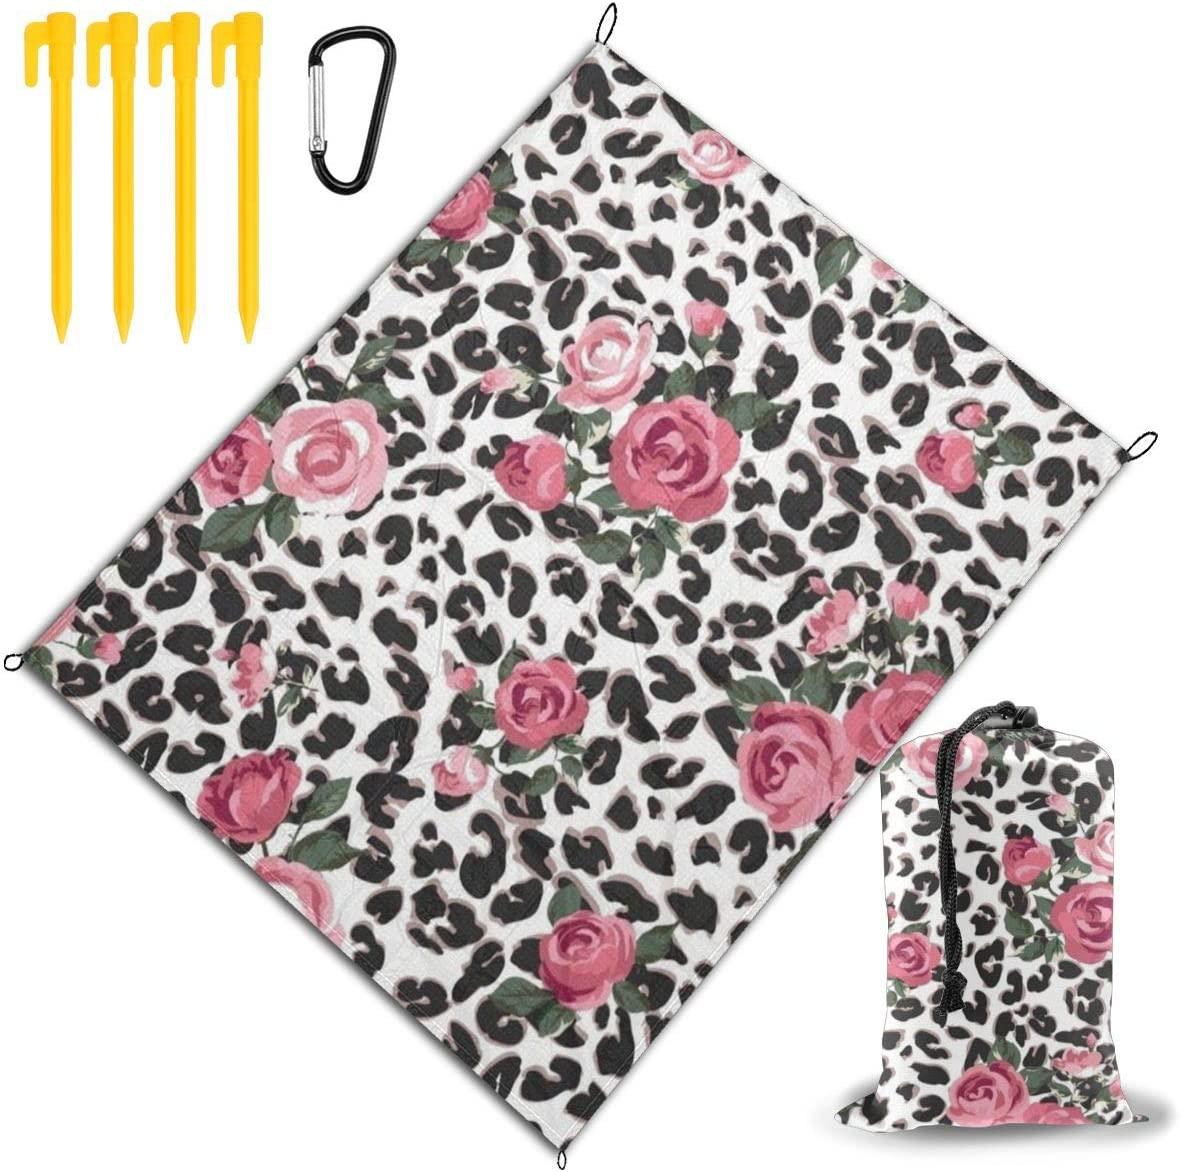 OESGAT Beach Blanket Waterproof,Cute Pink Rose Mix Leopard Pattern Printing Travel Outdoor Picnic Mat Durable Sand Beach Mat,67